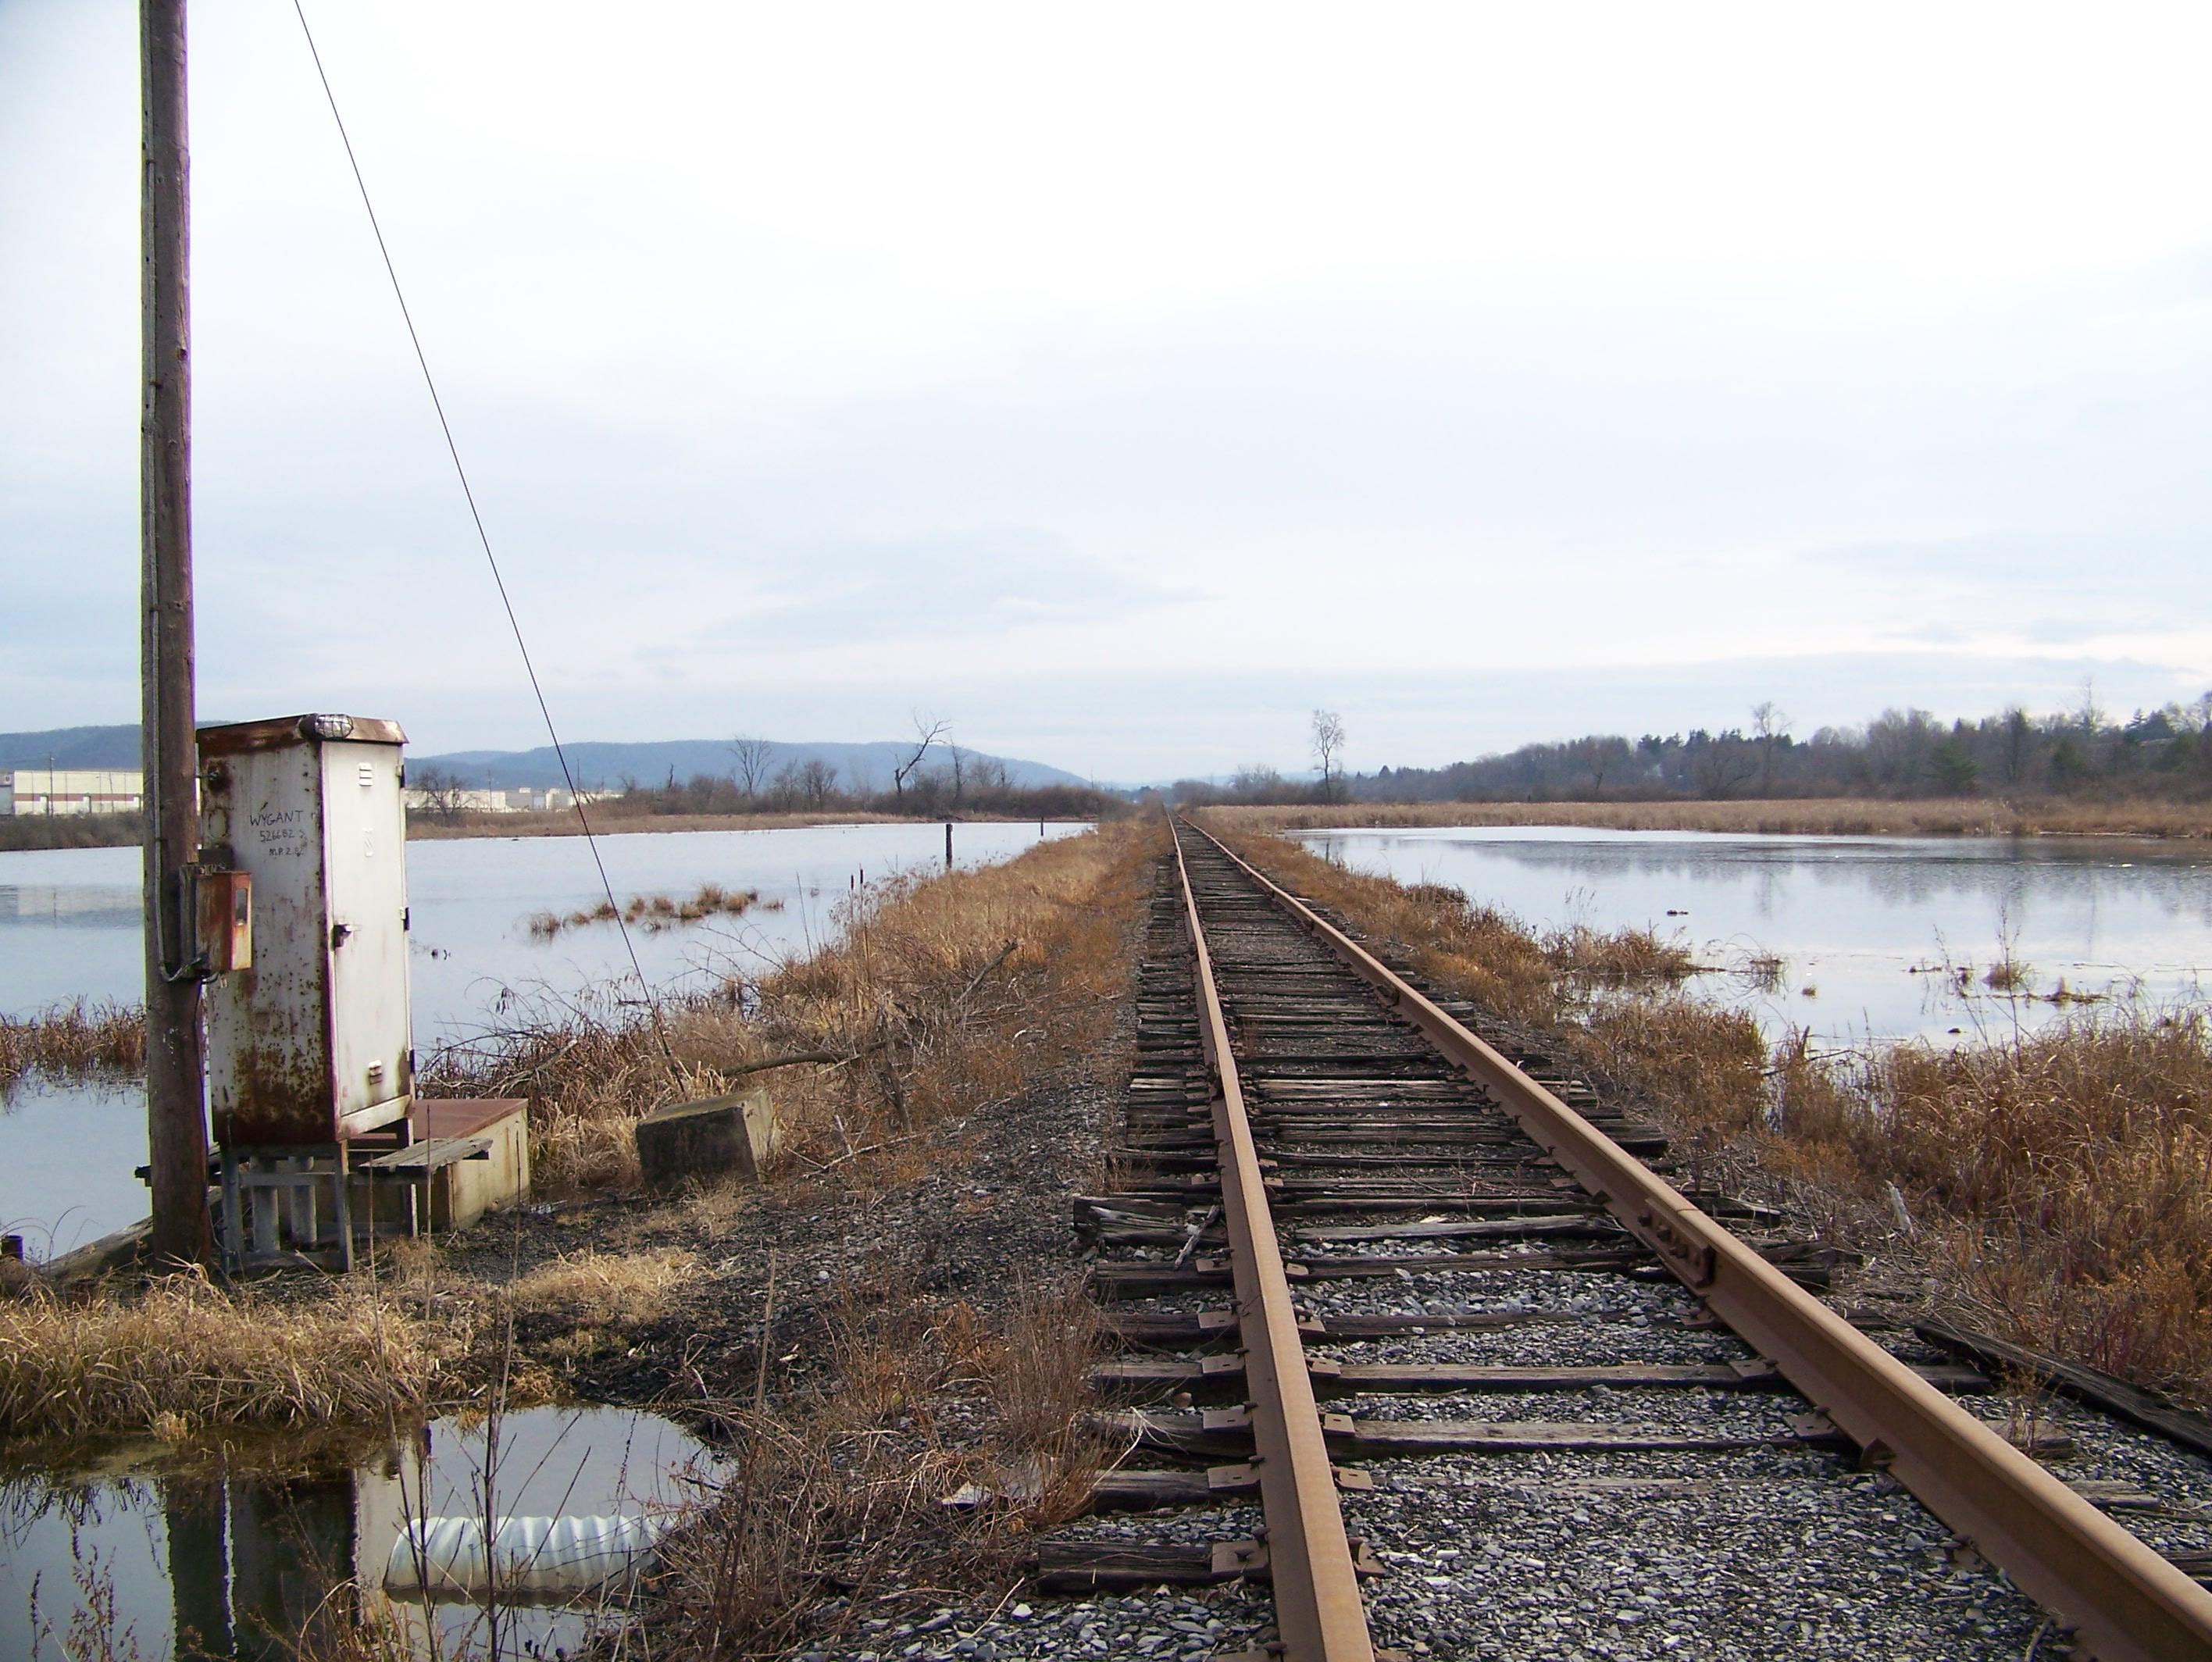 Train Tracks, Marshlands